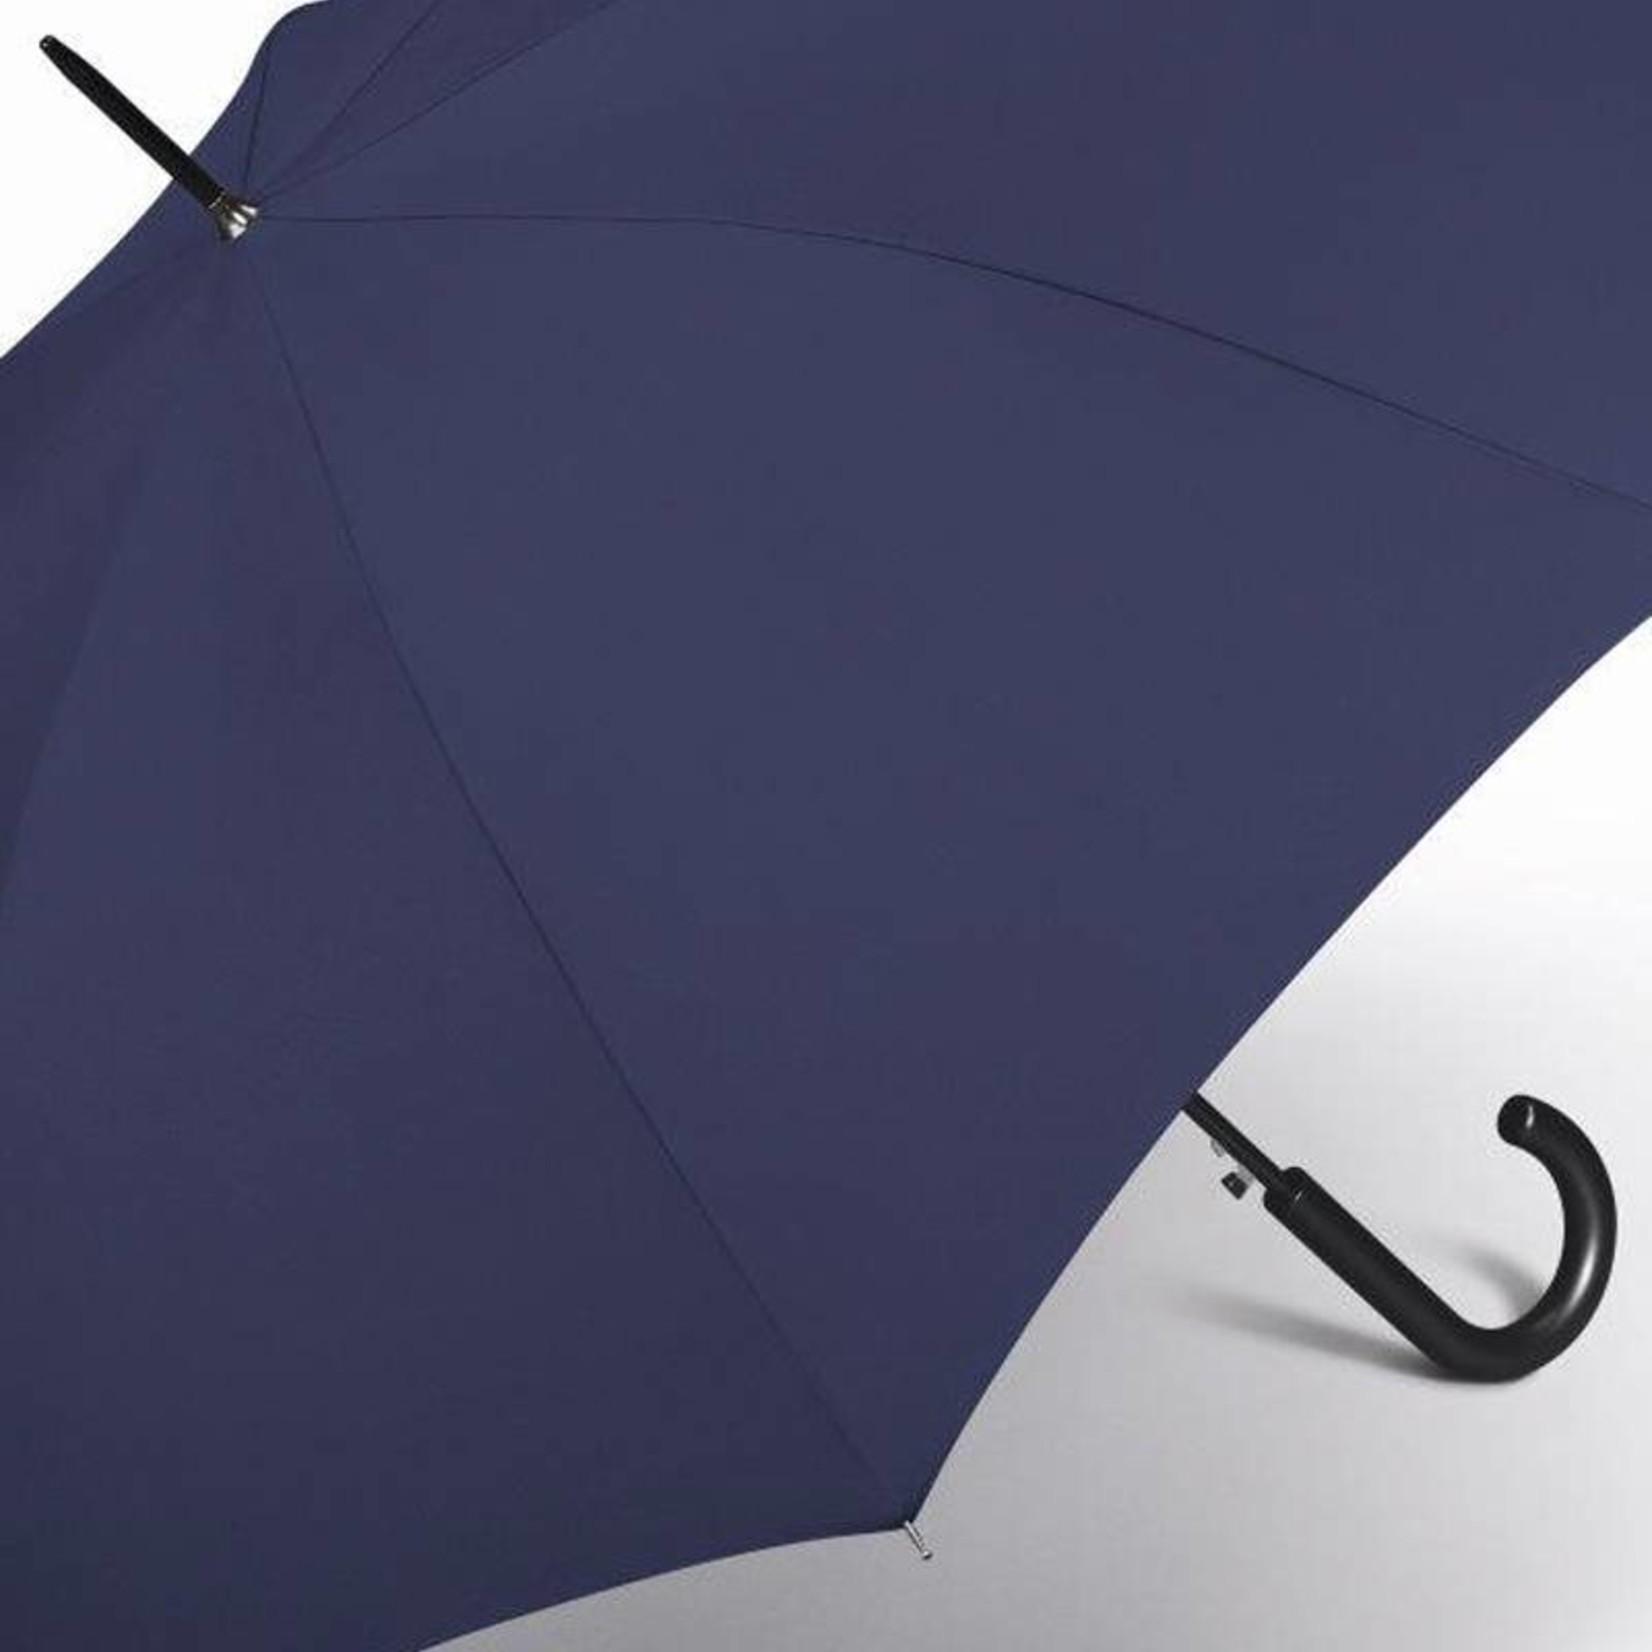 happy rain Stockschirm I navy blau I Automatik I happy rain Schirm